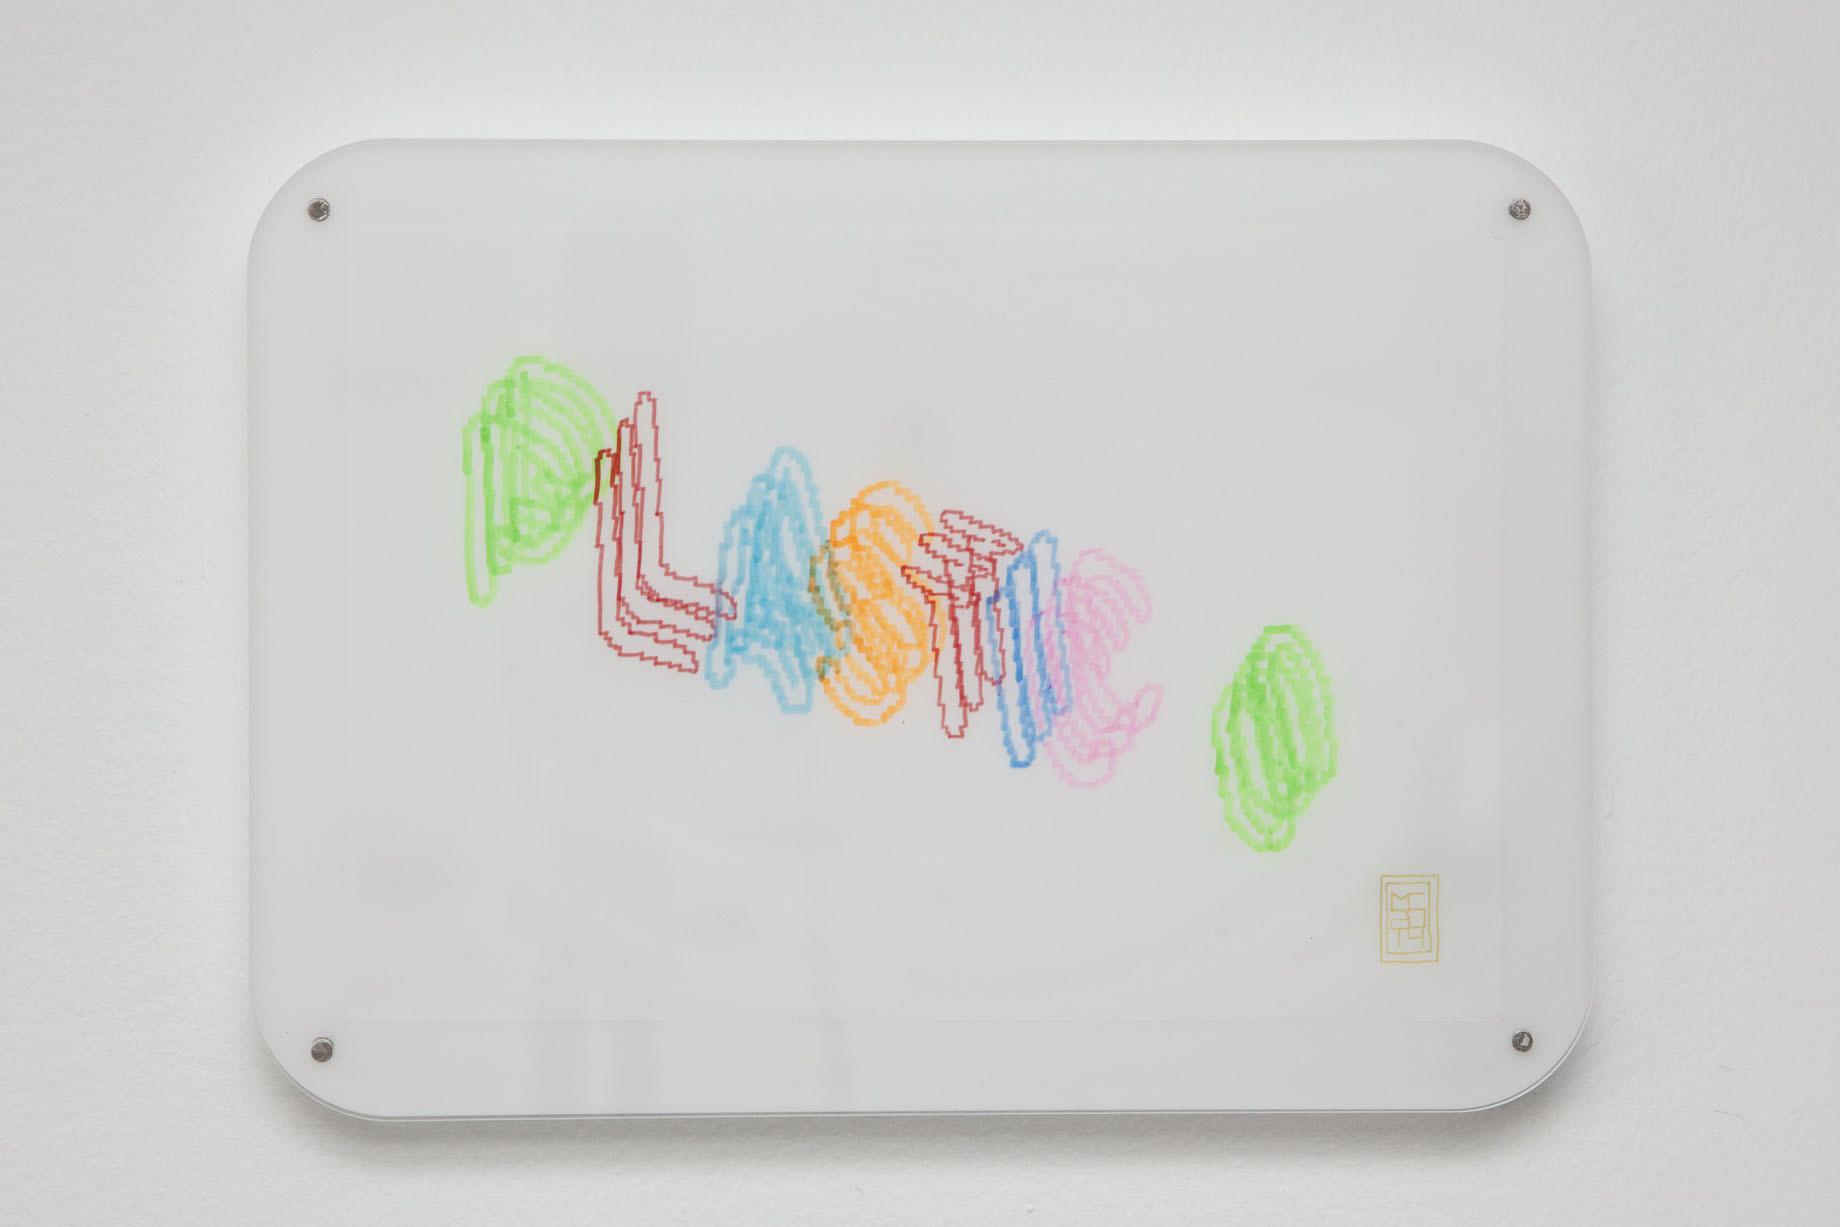 Michele Chiossi This is Plastic, 2014   plexiglas, magneti pennarelli, evidenziatore su carta da lucido disegno zigzag Plastic discoteca Milano #itsmilanobaby neon